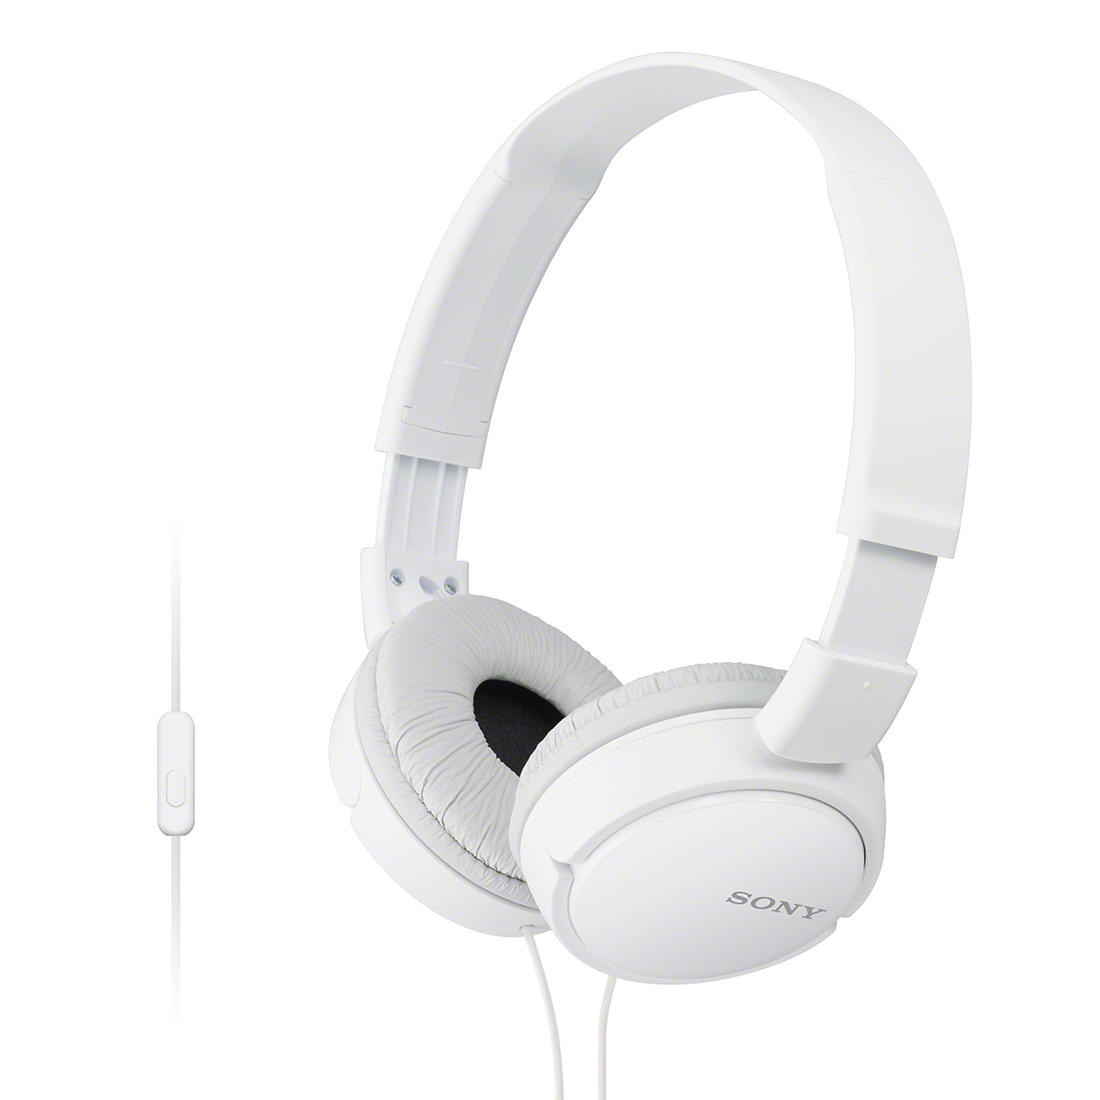 Sony On-Ear Extra Bass Headphones - White